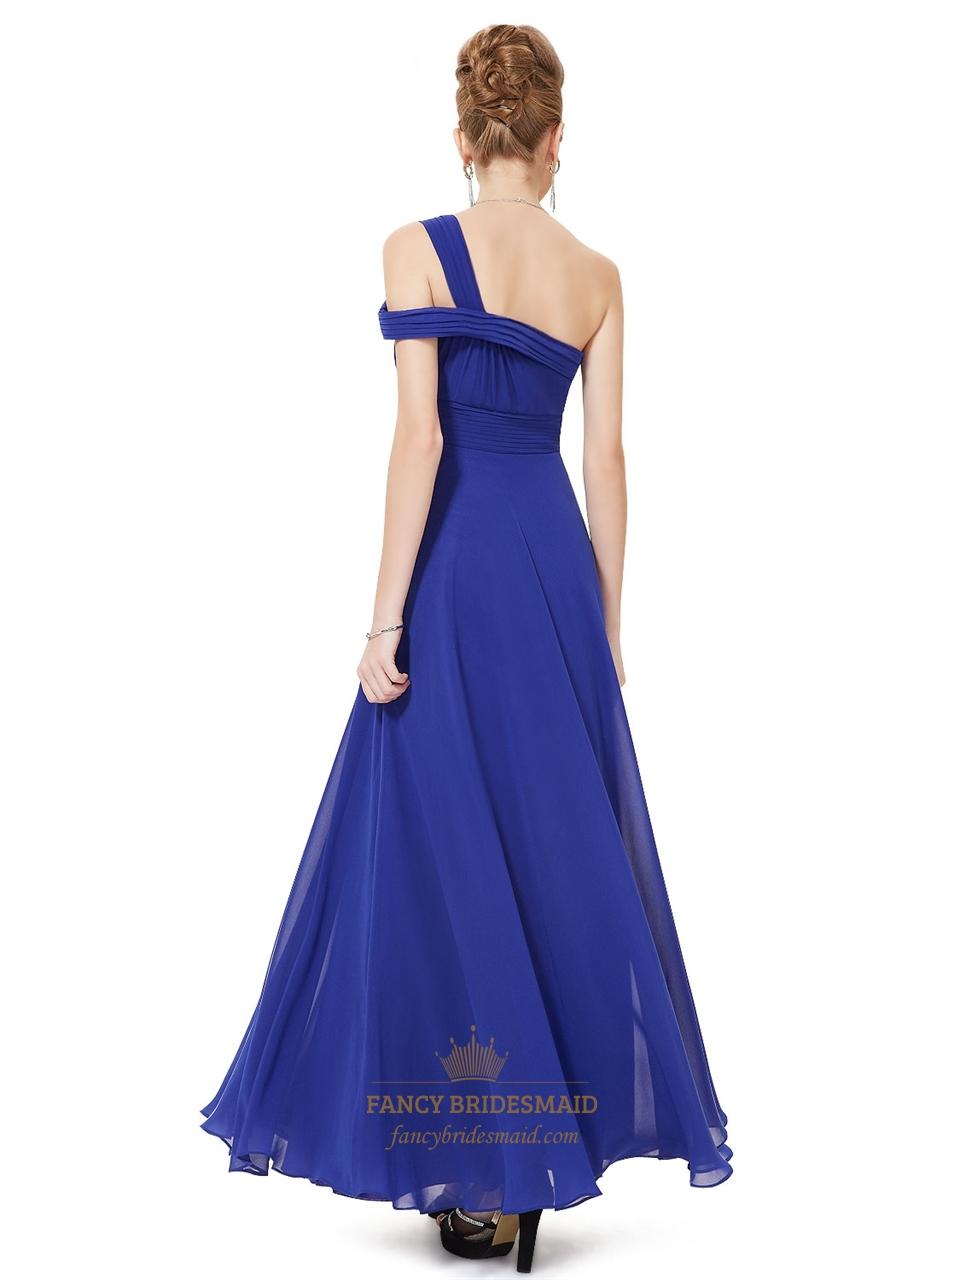 Dresses One Shoulder Royal Blue Bridesmaid Evening Prom Ball Dress OneOne Shoulder Royal Blue Bridesmaid Dresses